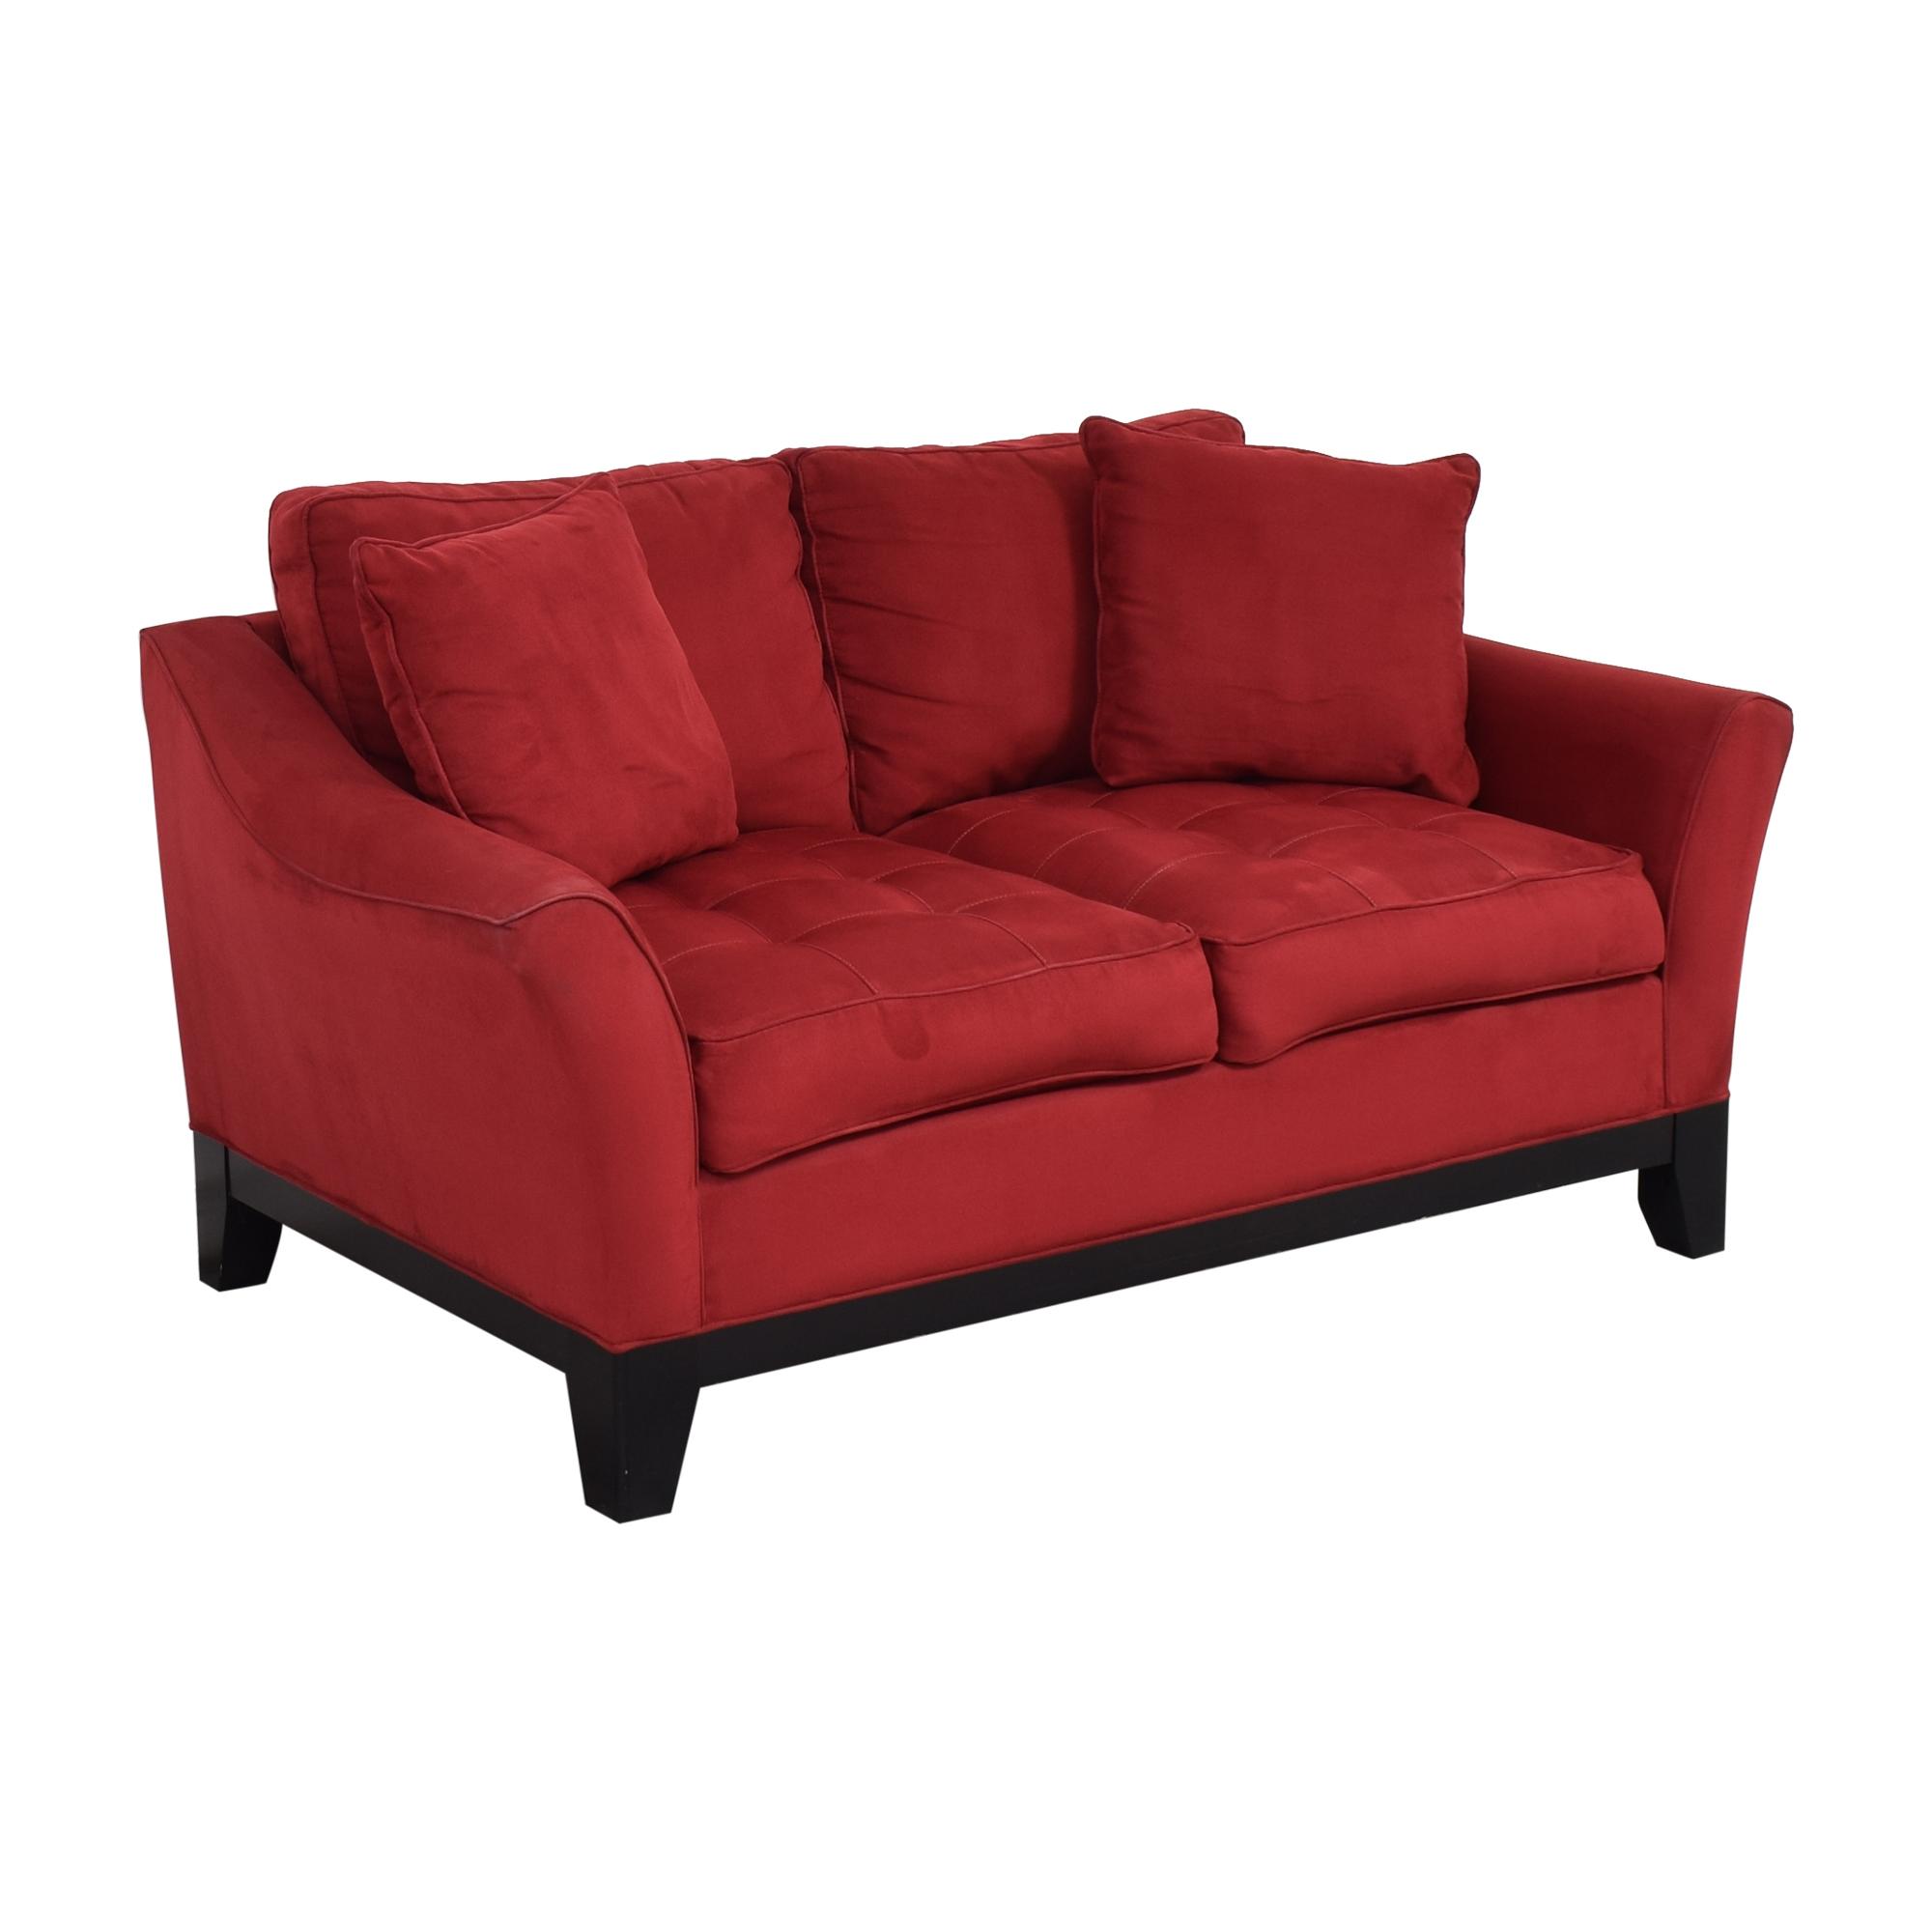 buy Raymour & Flanigan Tufted Cushion Loveseat Raymour & Flanigan Loveseats